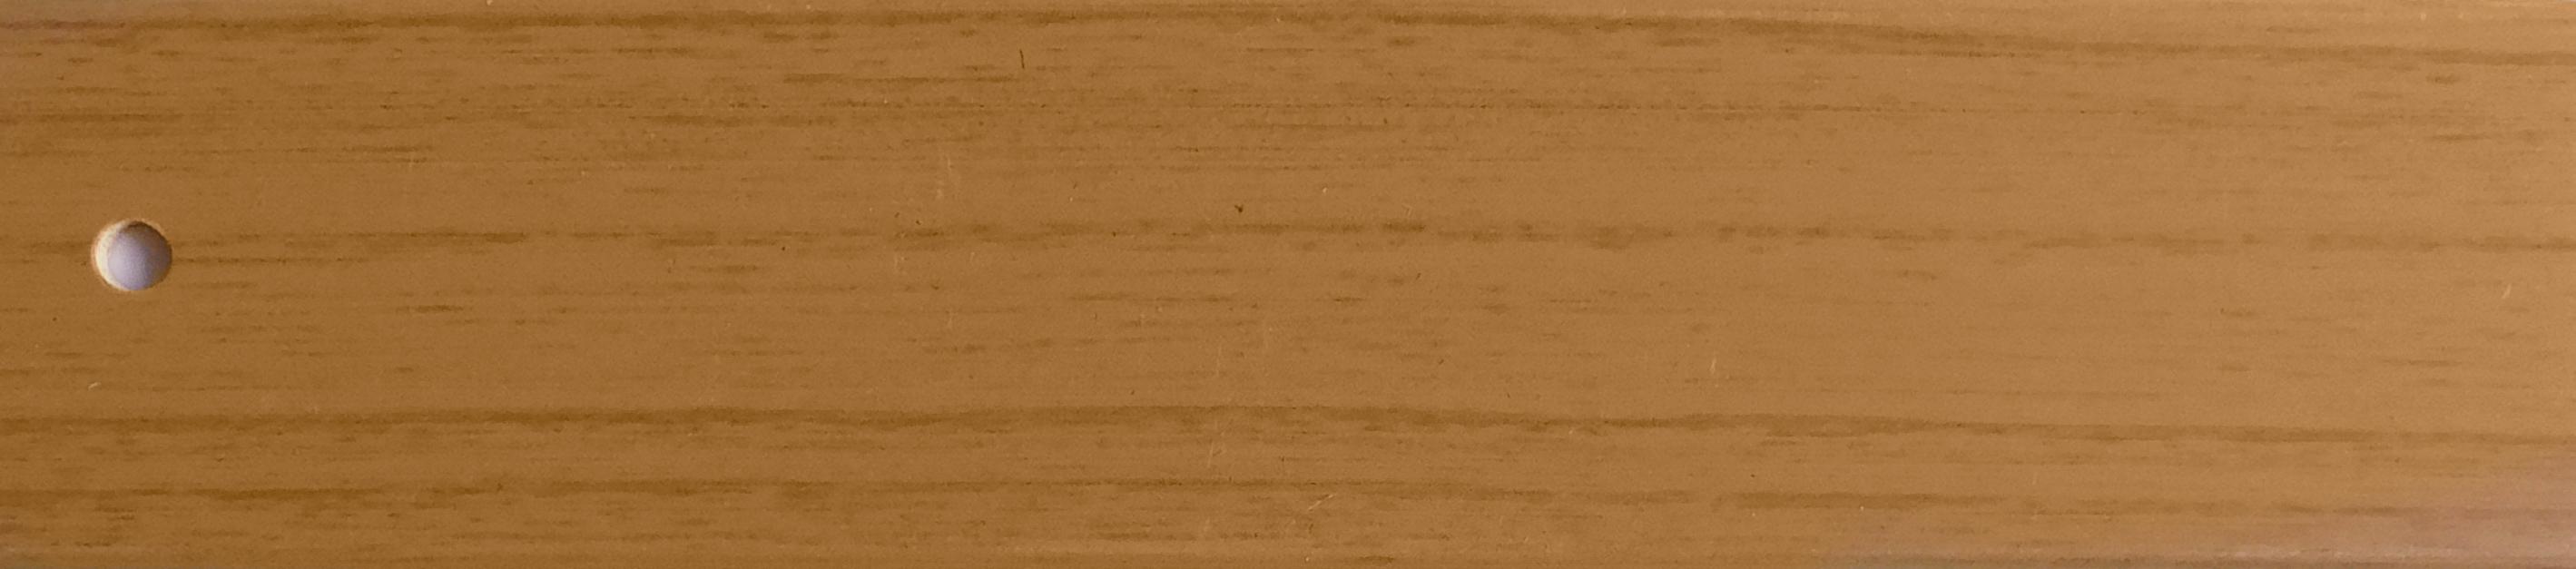 Desert Oak Fauxwood blind slat